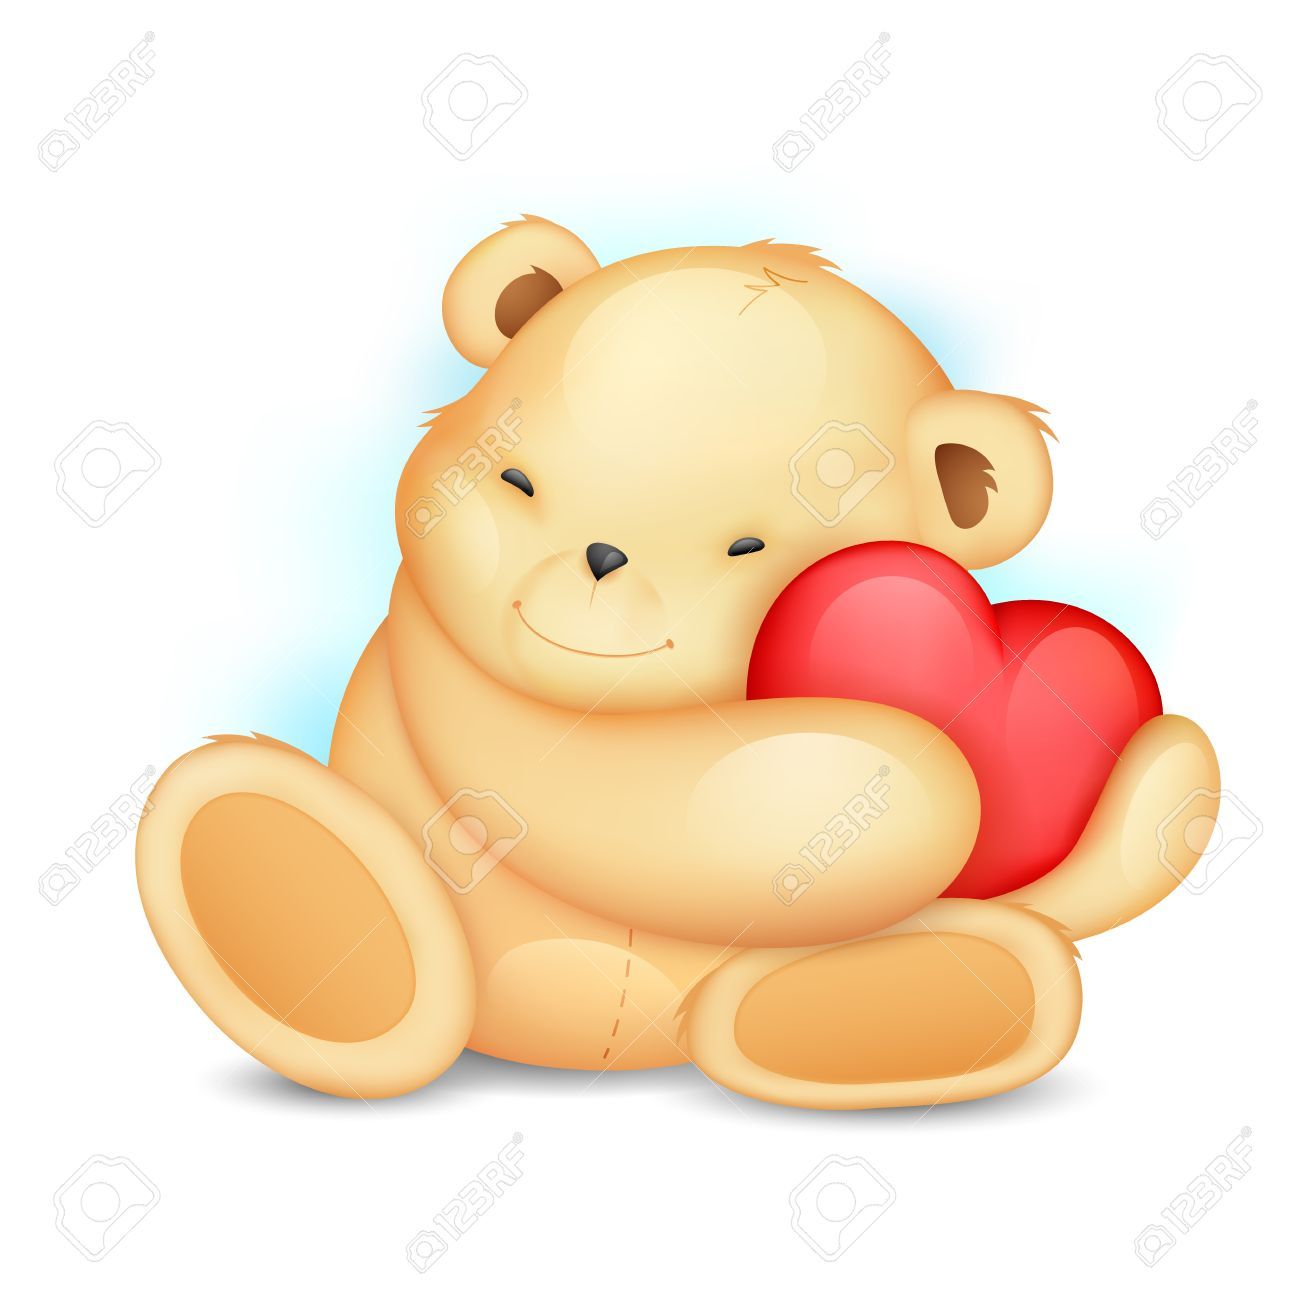 illustration of cute teddy bear holding heart Stock Vector - 17376417